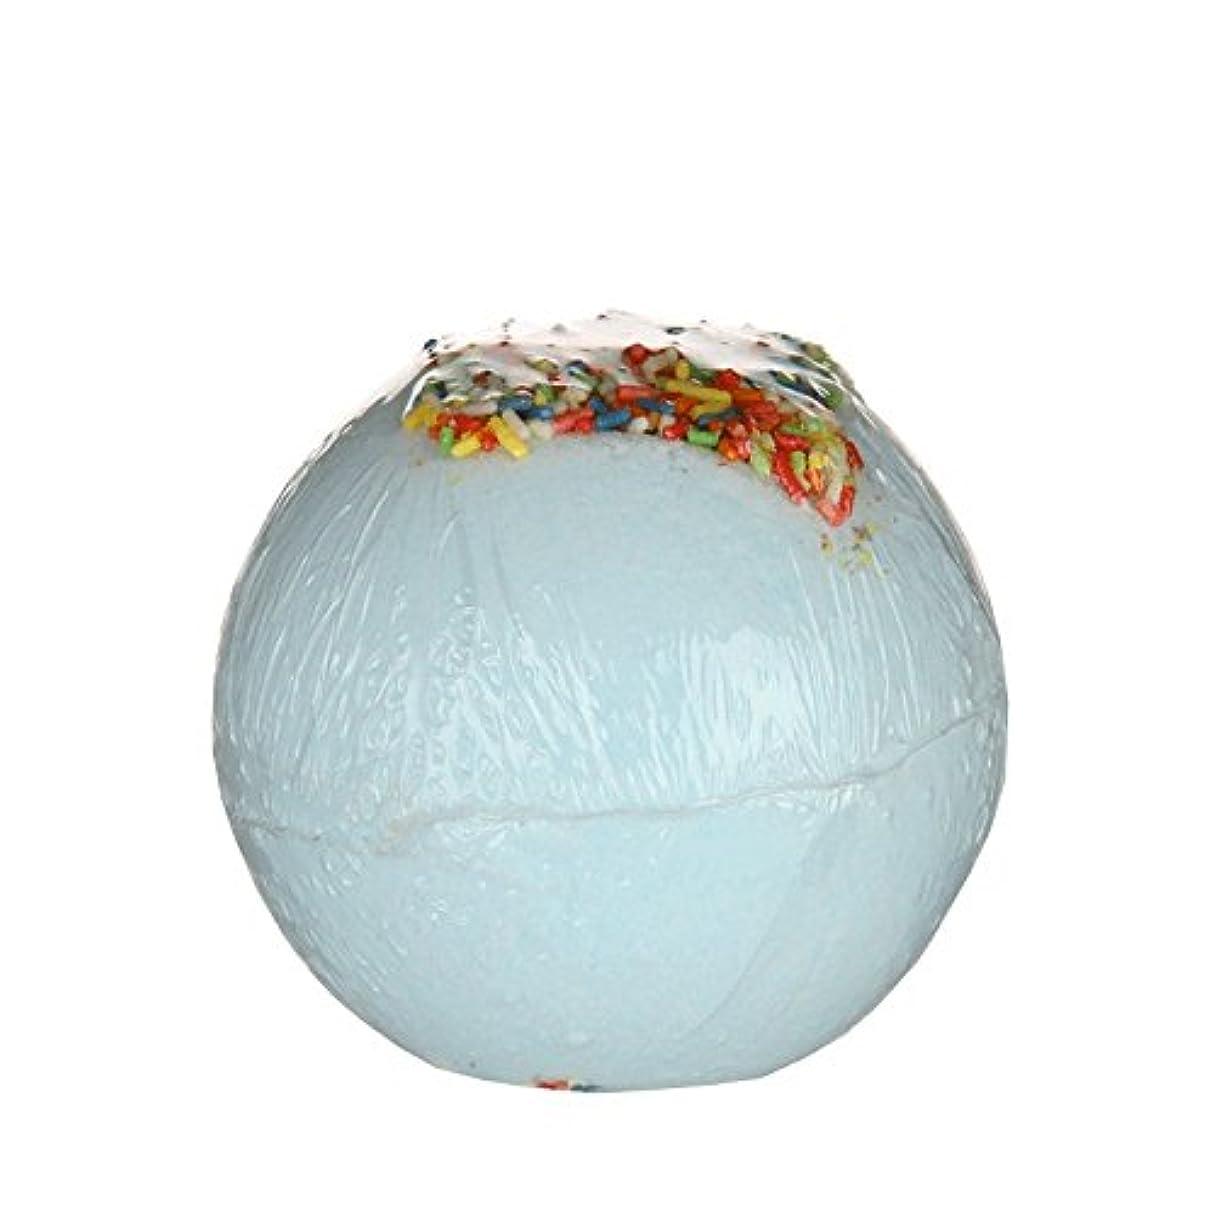 Treetsバスボールディスコバス170グラム - Treets Bath Ball Disco Bath 170g (Treets) [並行輸入品]